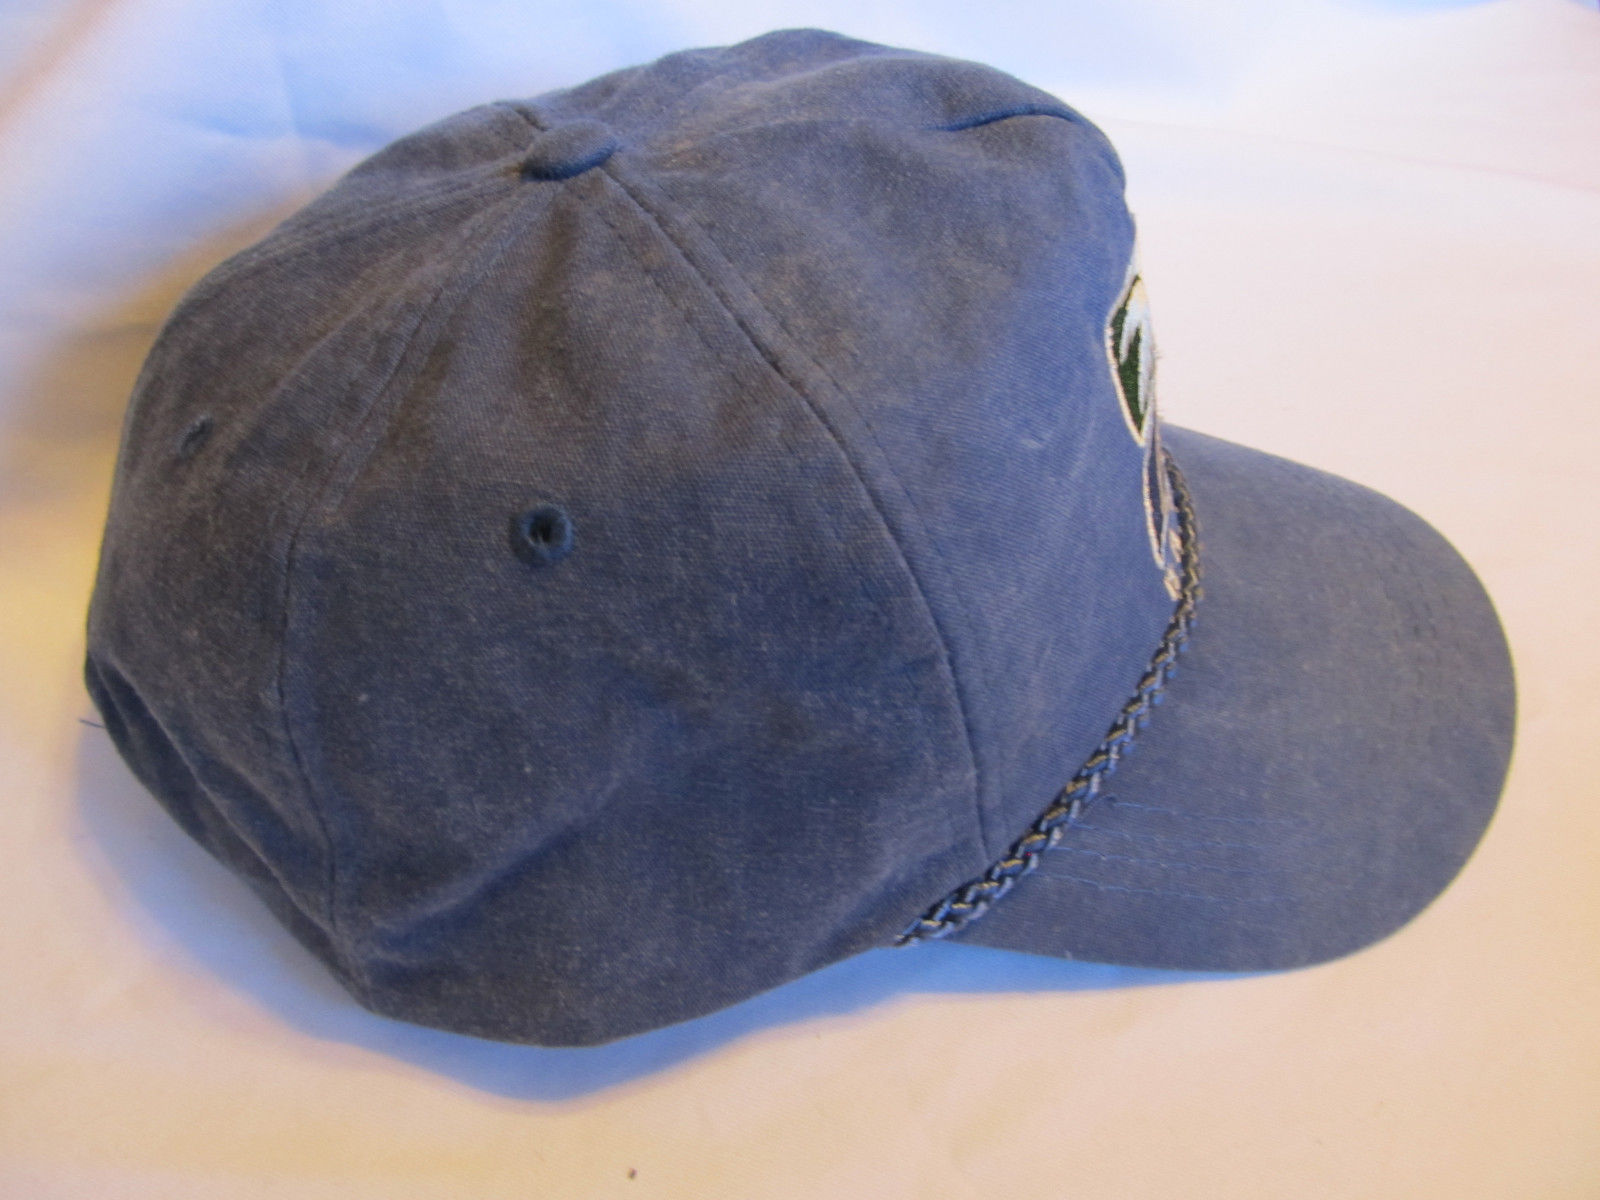 Blue Hawaii Palm Tree Ball cap Baseball hat Sportcap Very Nice Condition